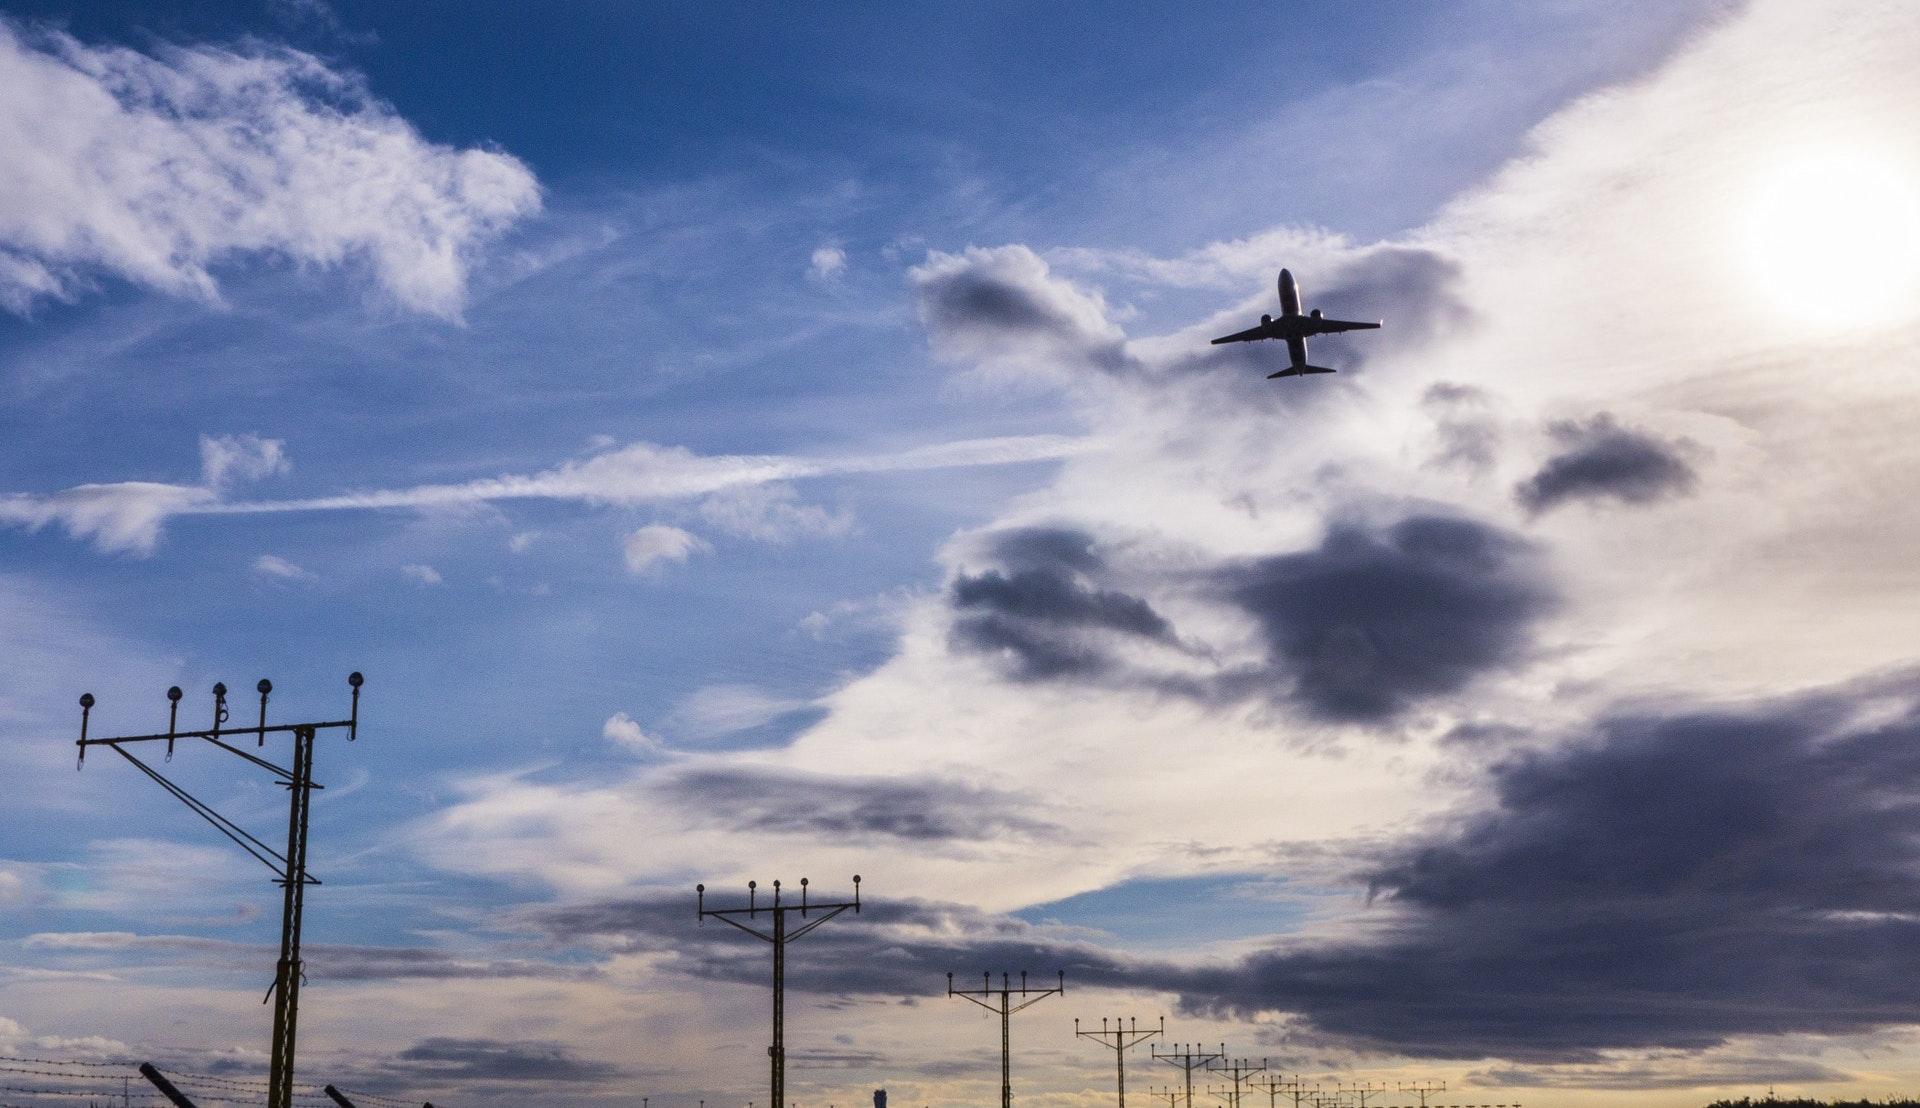 Flyavgang fra Malaga lufthavn © Manolo Franco, Pixabay